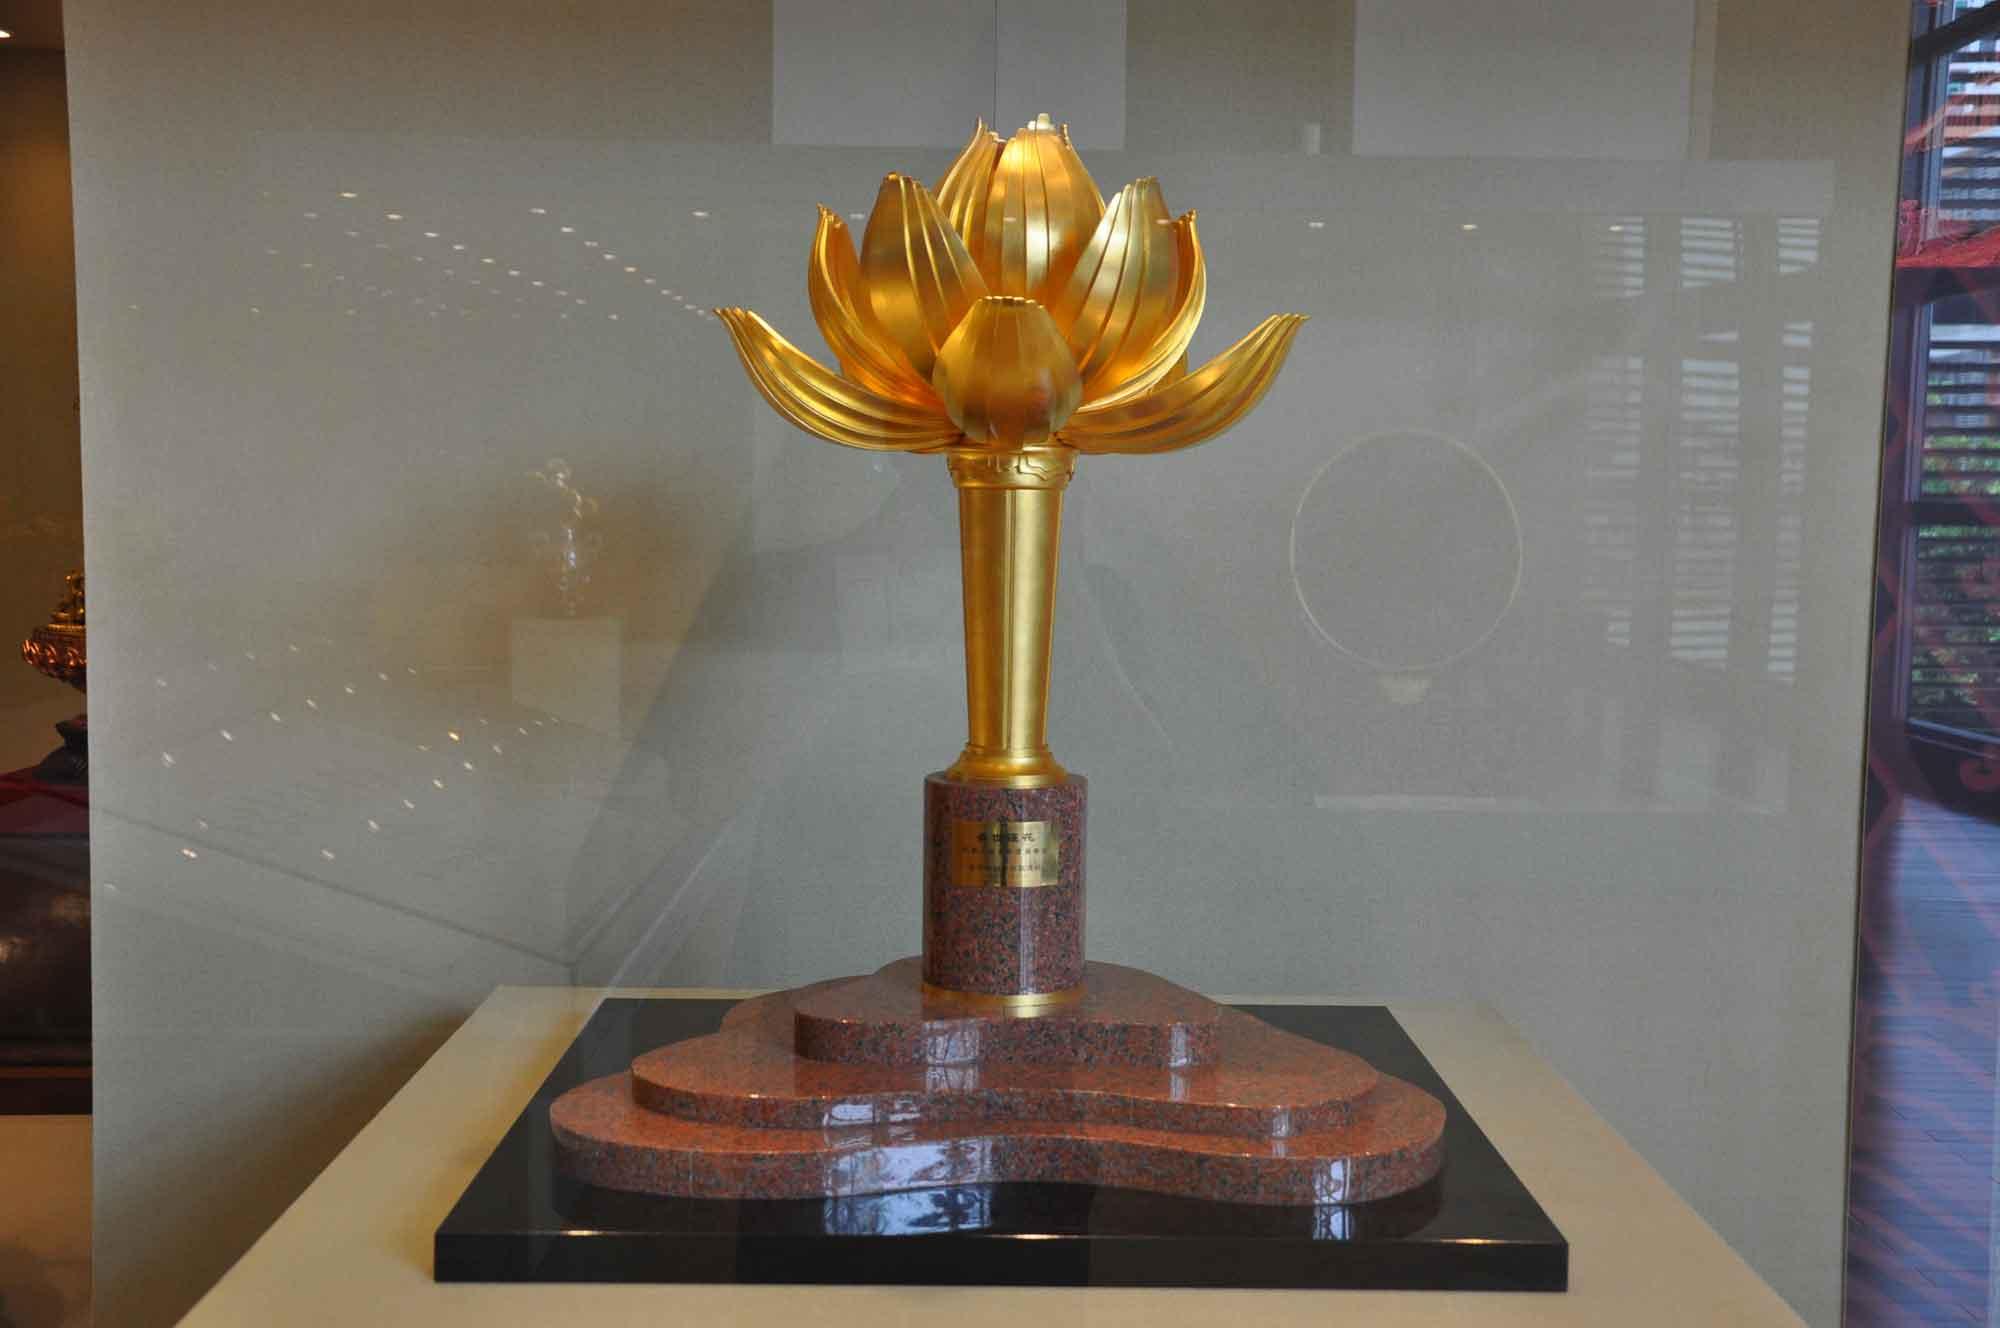 Handover Gifts Museum Macau lotus flower